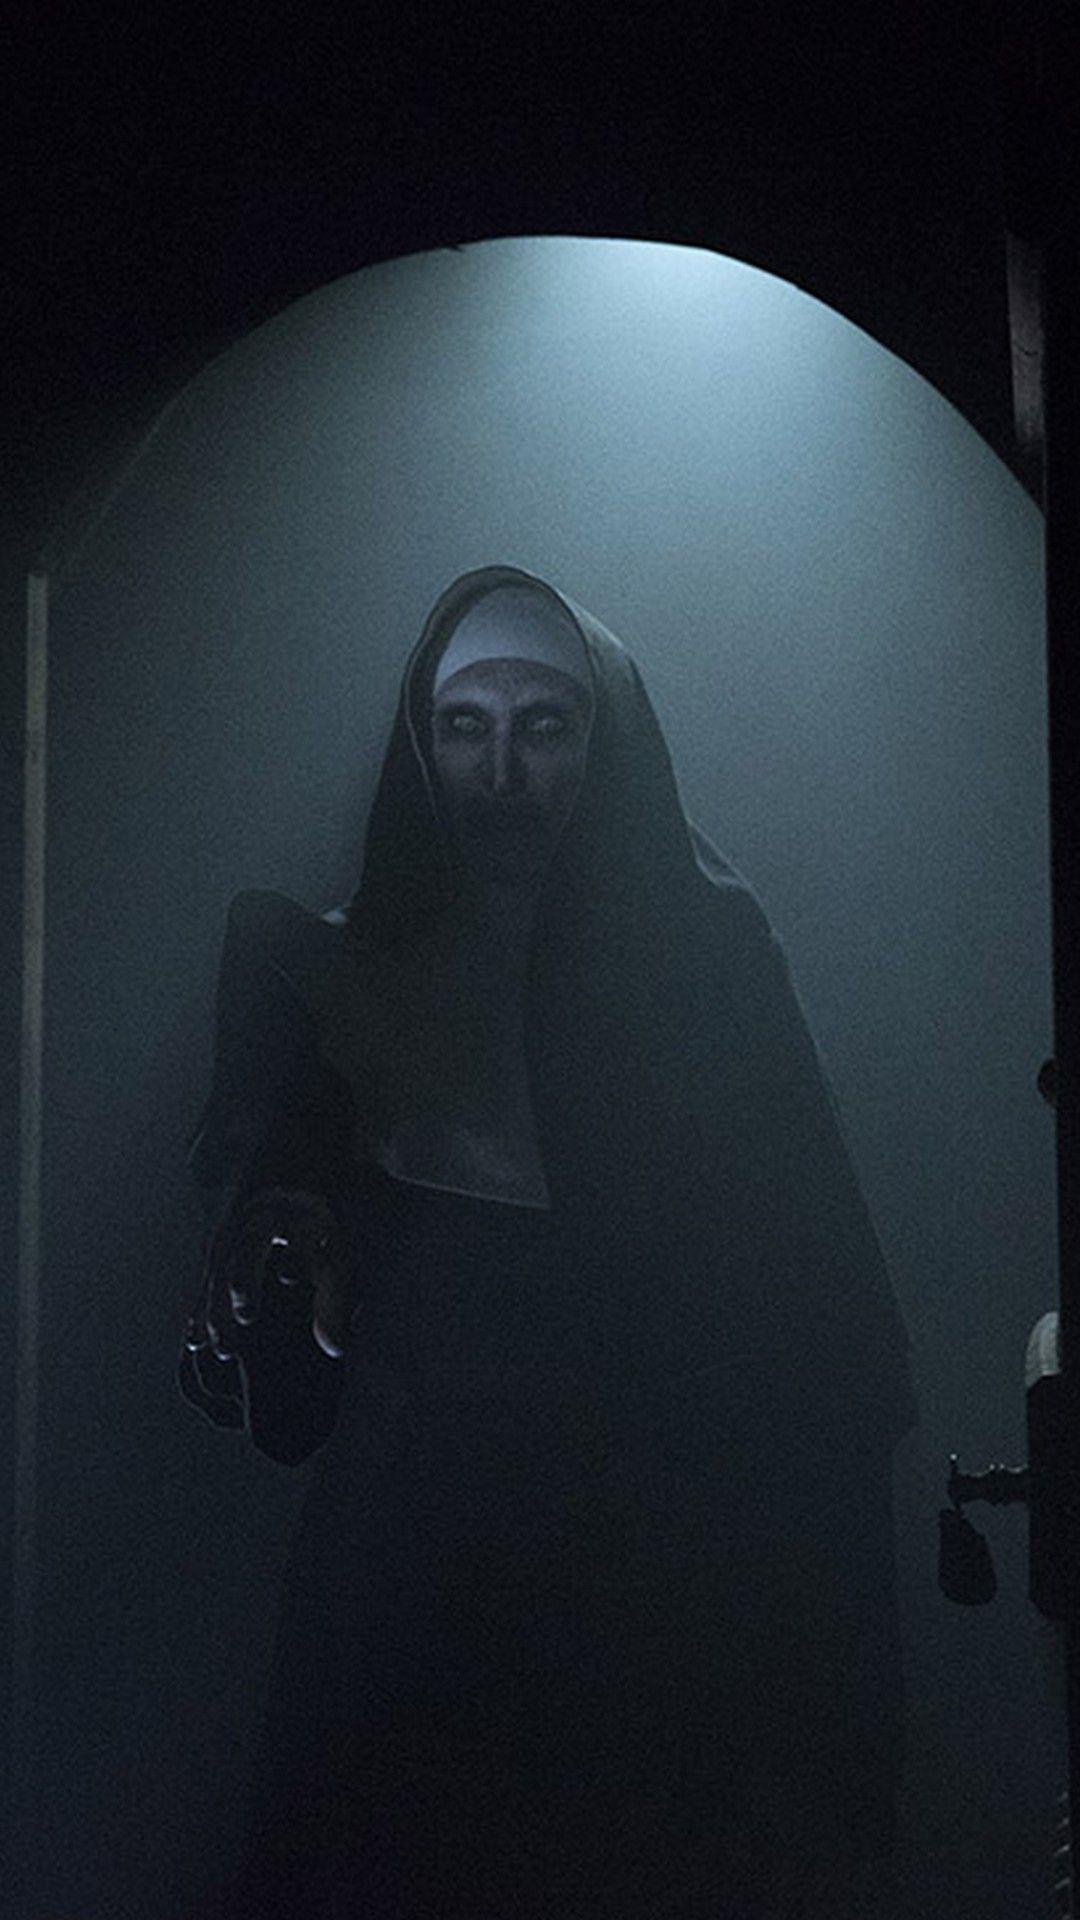 Pin By Mitchell Gavazzi On Wallpapers De Terror Para Celular Valak Horror Movie Icons Horror Movie Art